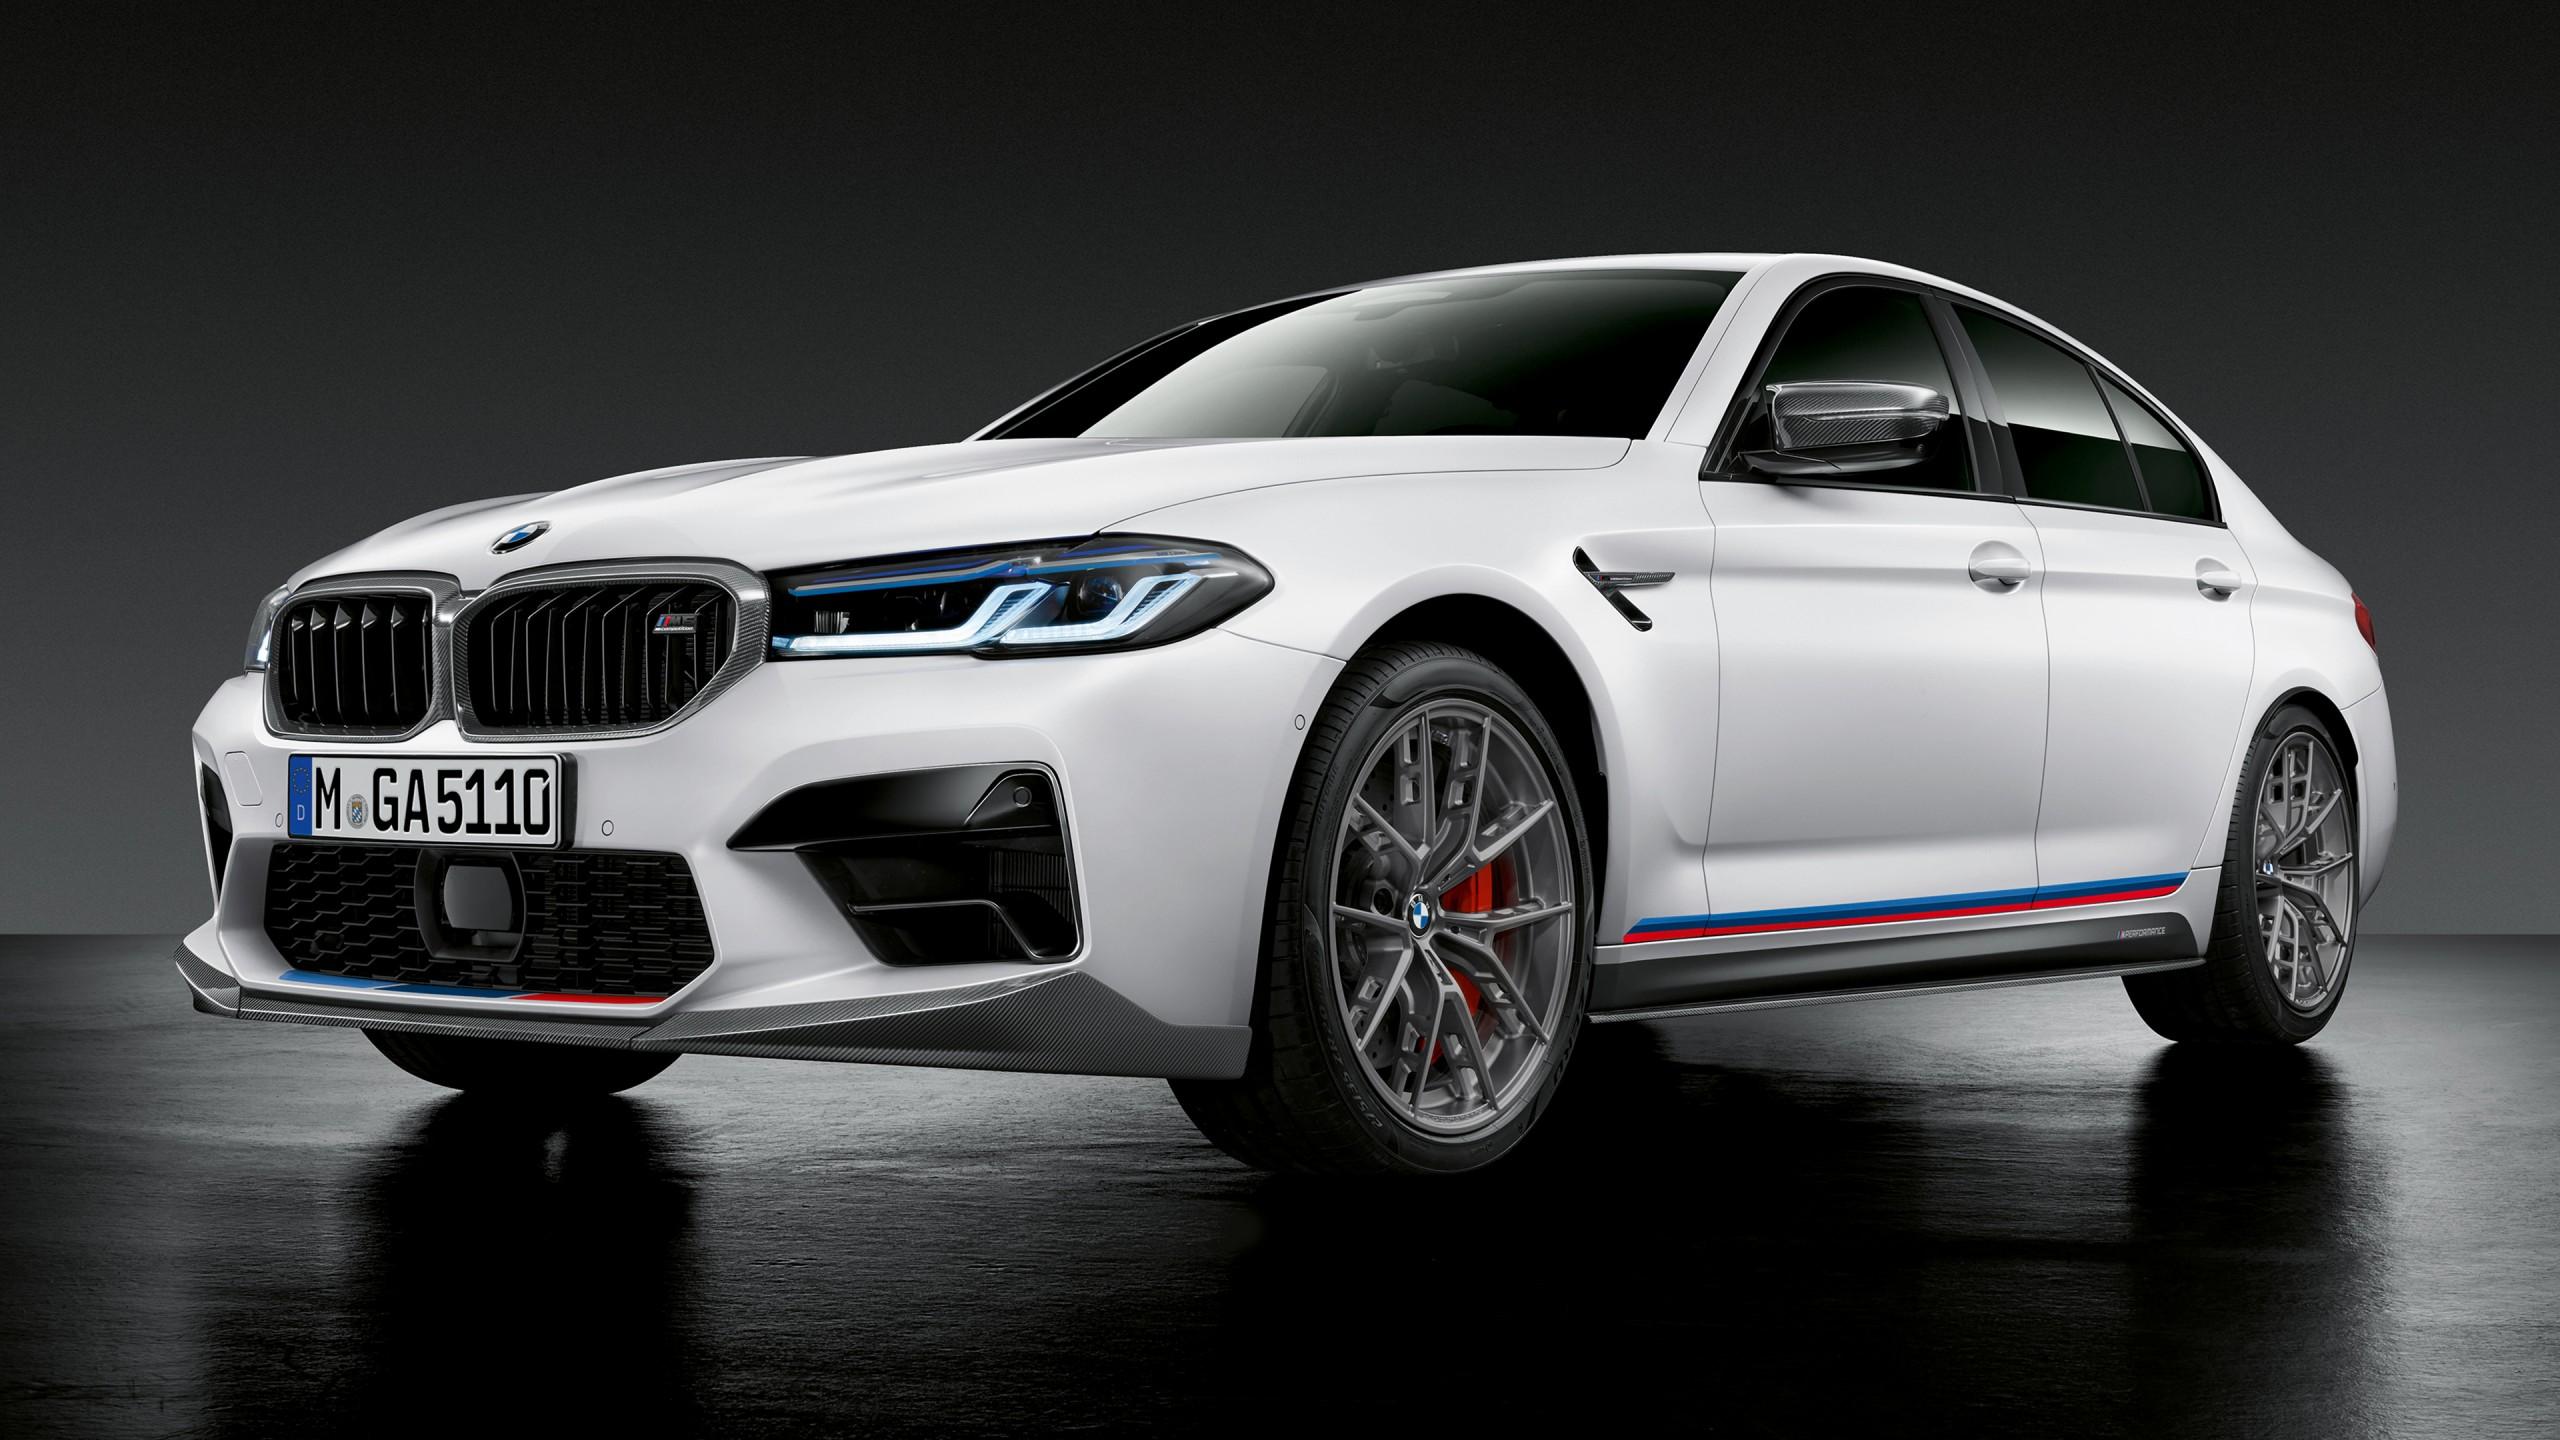 BMW M5 Competition M Performance Parts 2020 4K Wallpaper ...